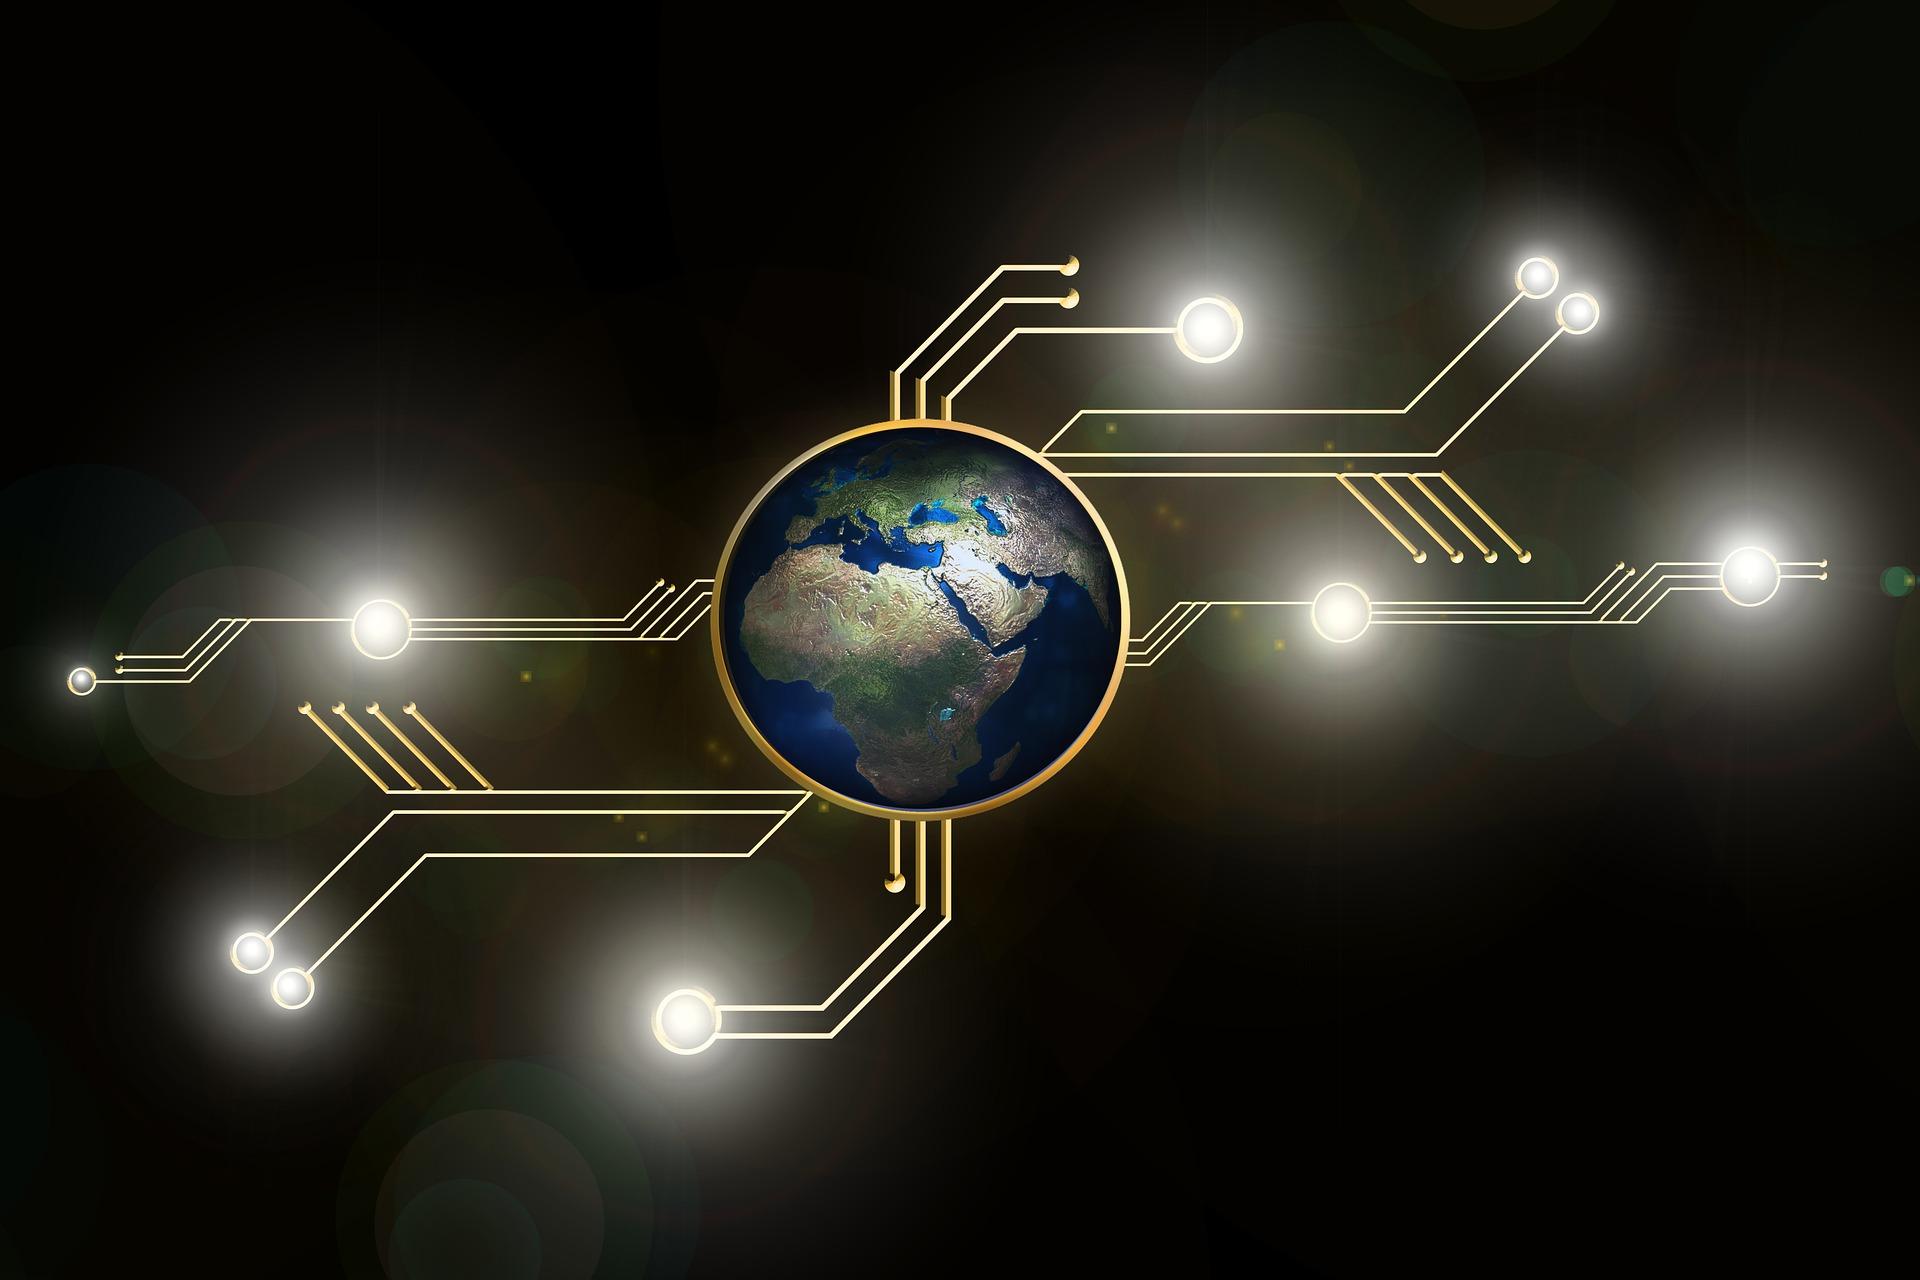 Bitcoin peer to peer network